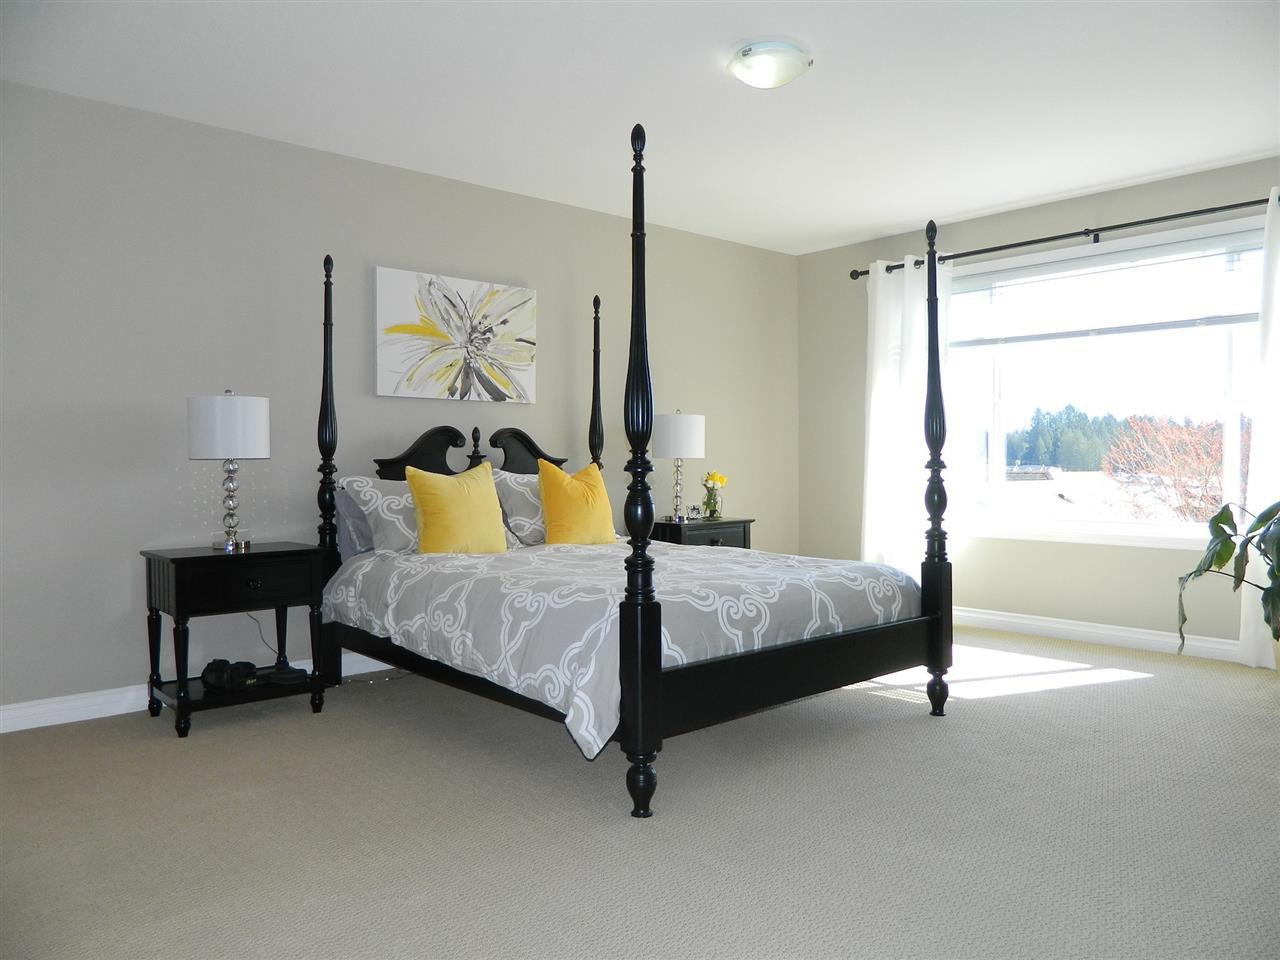 Photo 10: Photos: 24332 104 AVENUE in Maple Ridge: Albion House for sale : MLS®# R2051414